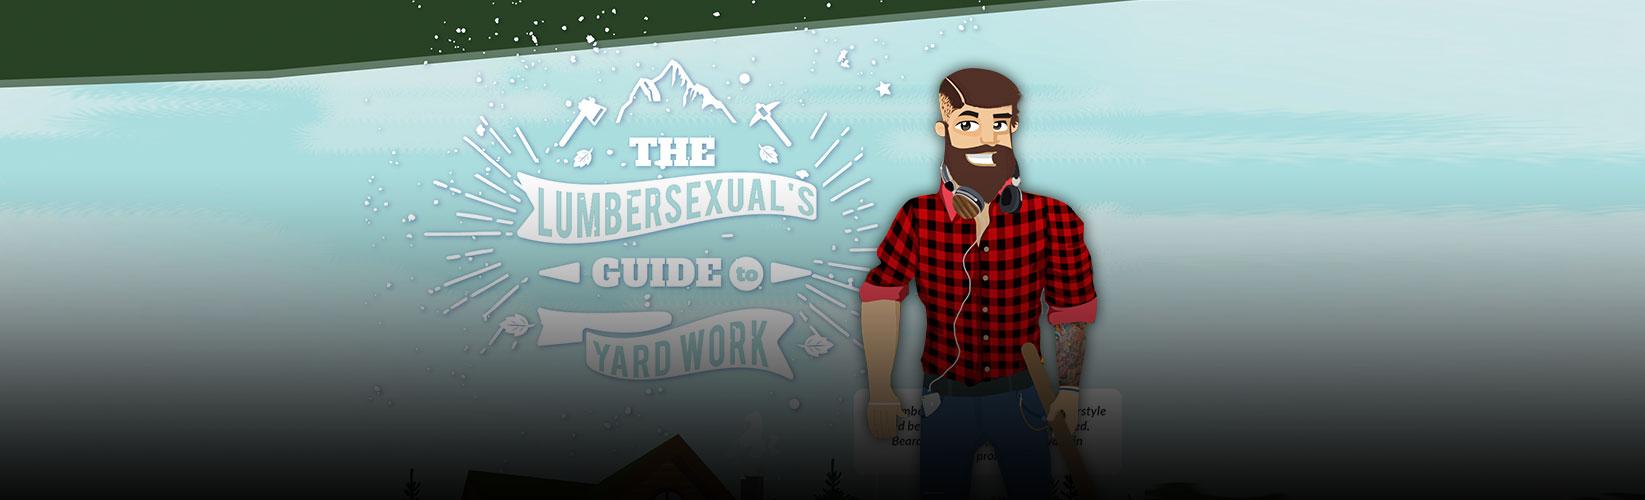 Lumbersexual Guide to Yard Work